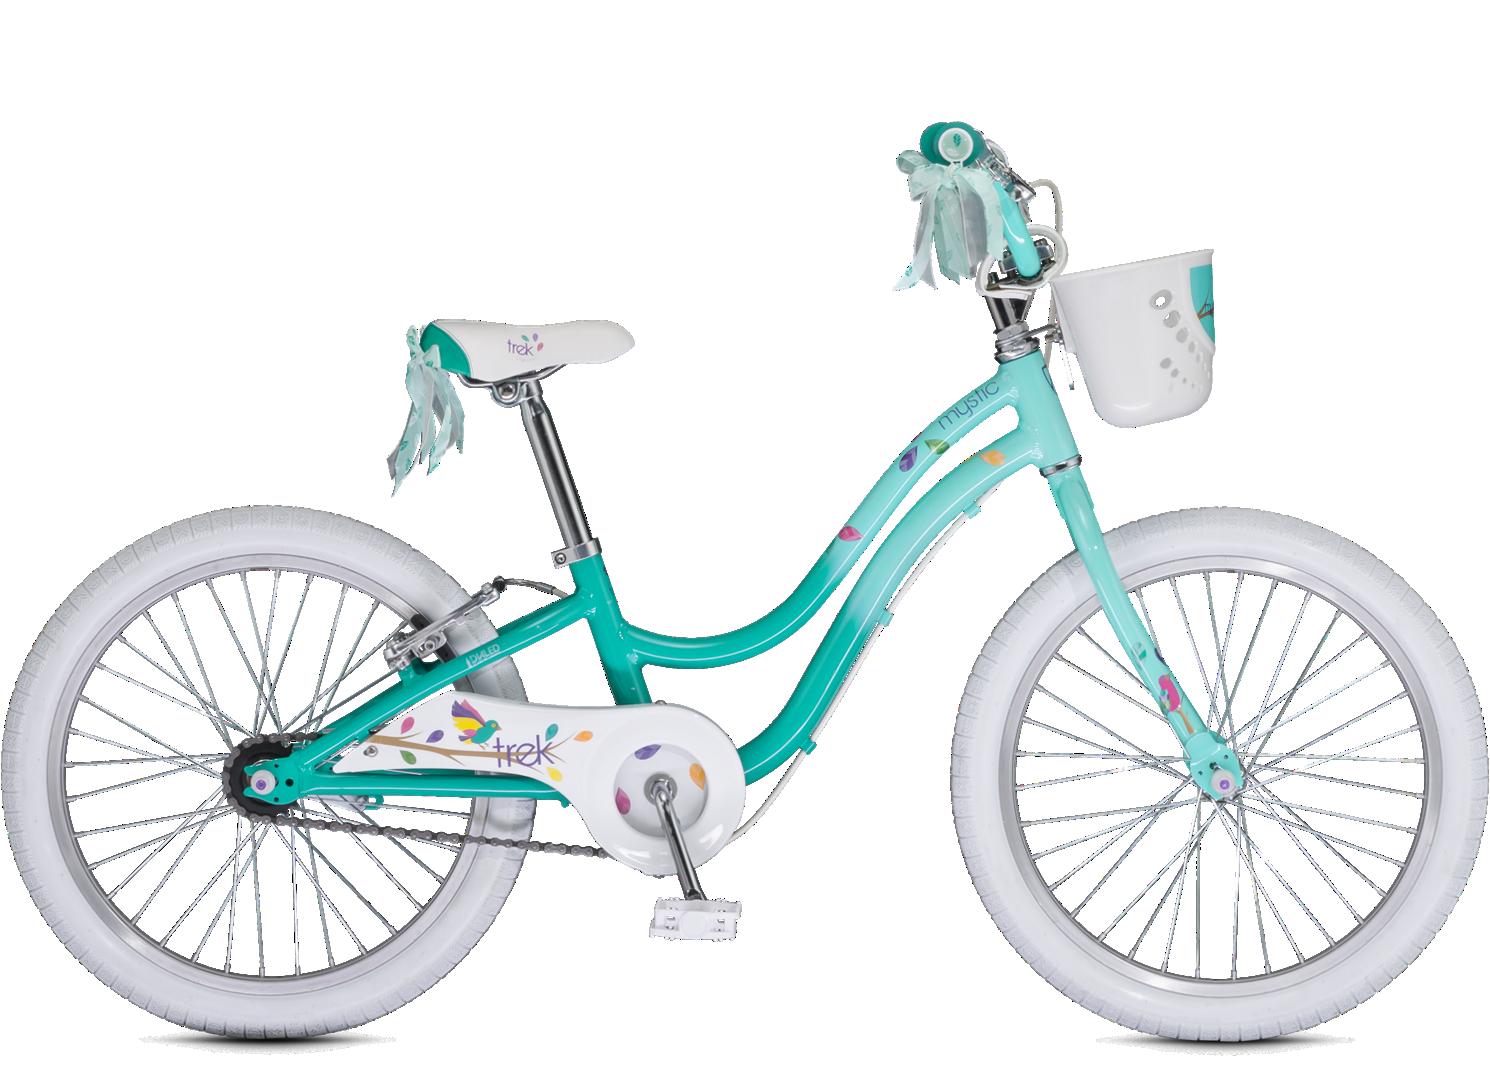 3443af8a203 Mystic 20 - Kids' collection - Trek Bicycle   S16_BIC_Kids   Kids ...